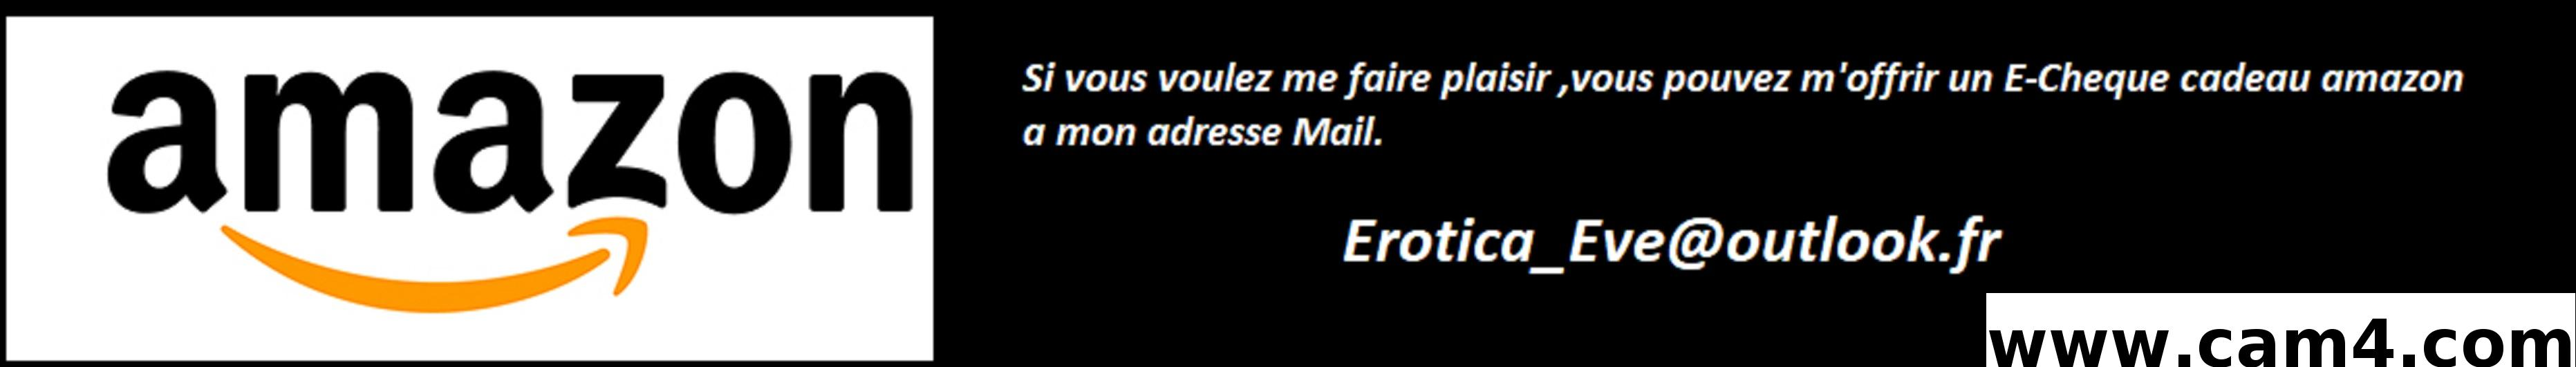 Erotica eve?s=0pvvkleg8tge6fub6wltwgrdl+6gxenvgdi8ctfzve8=